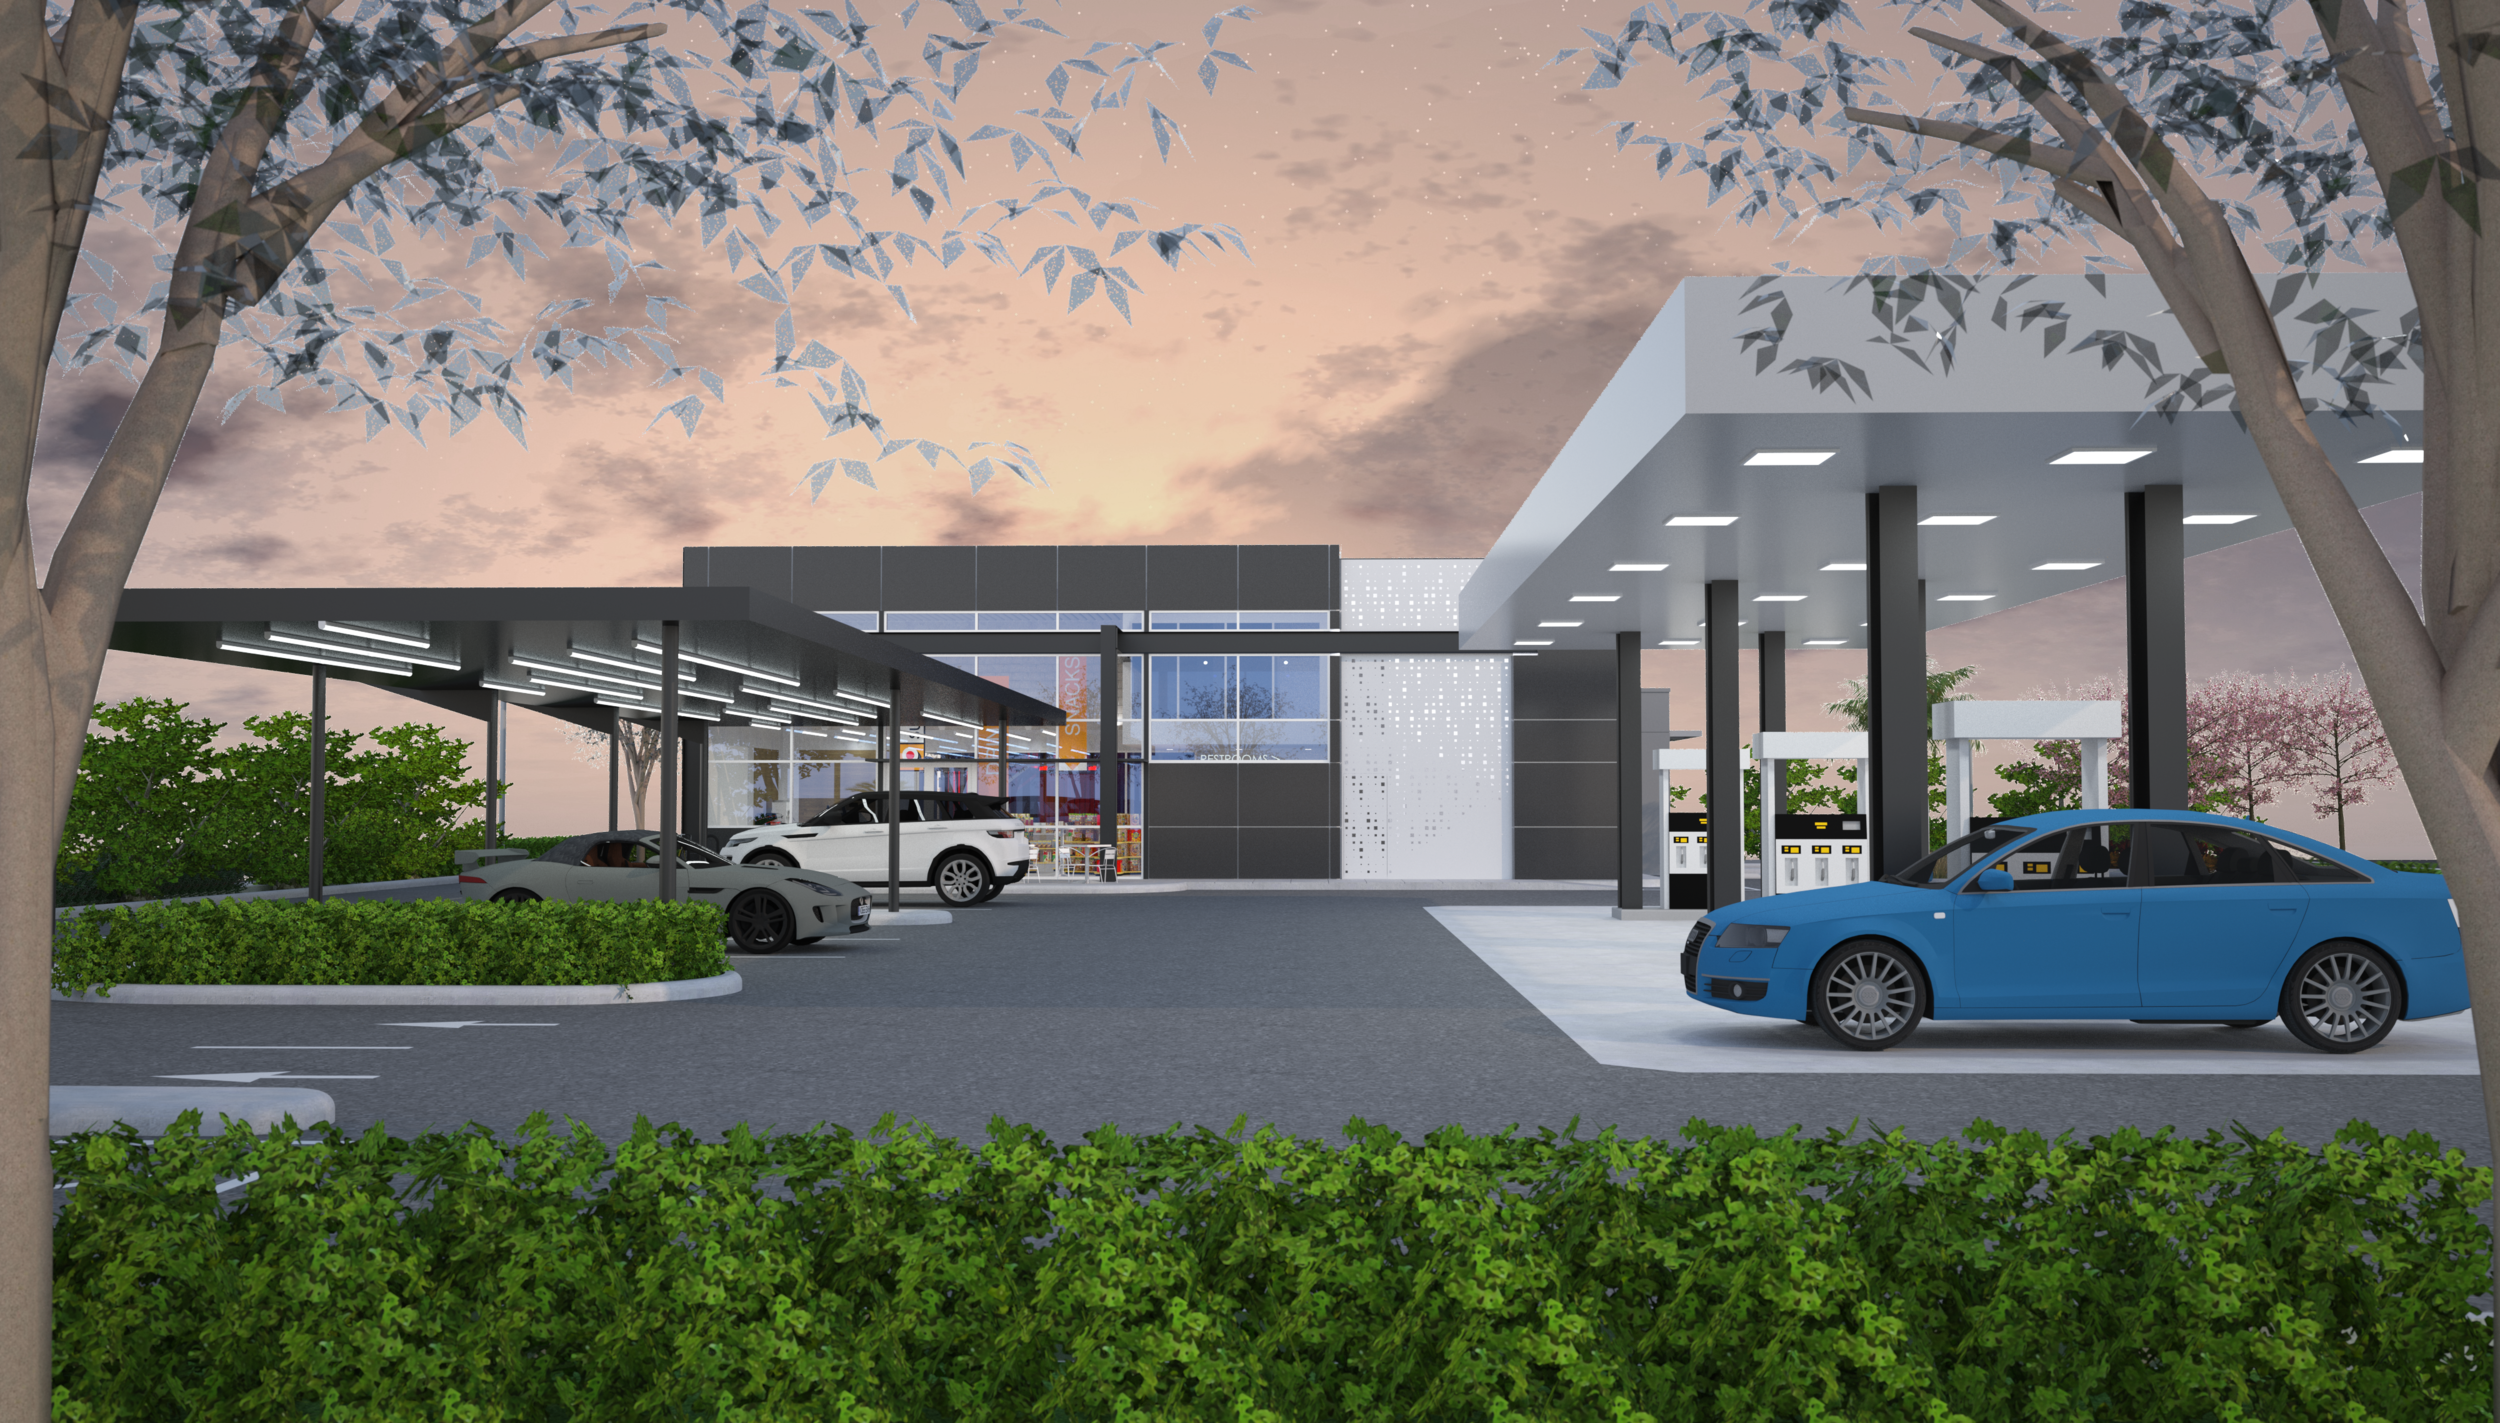 Car Wash Boca Raton >> Boca Raton Filling Station Car Wash Oa Architecture